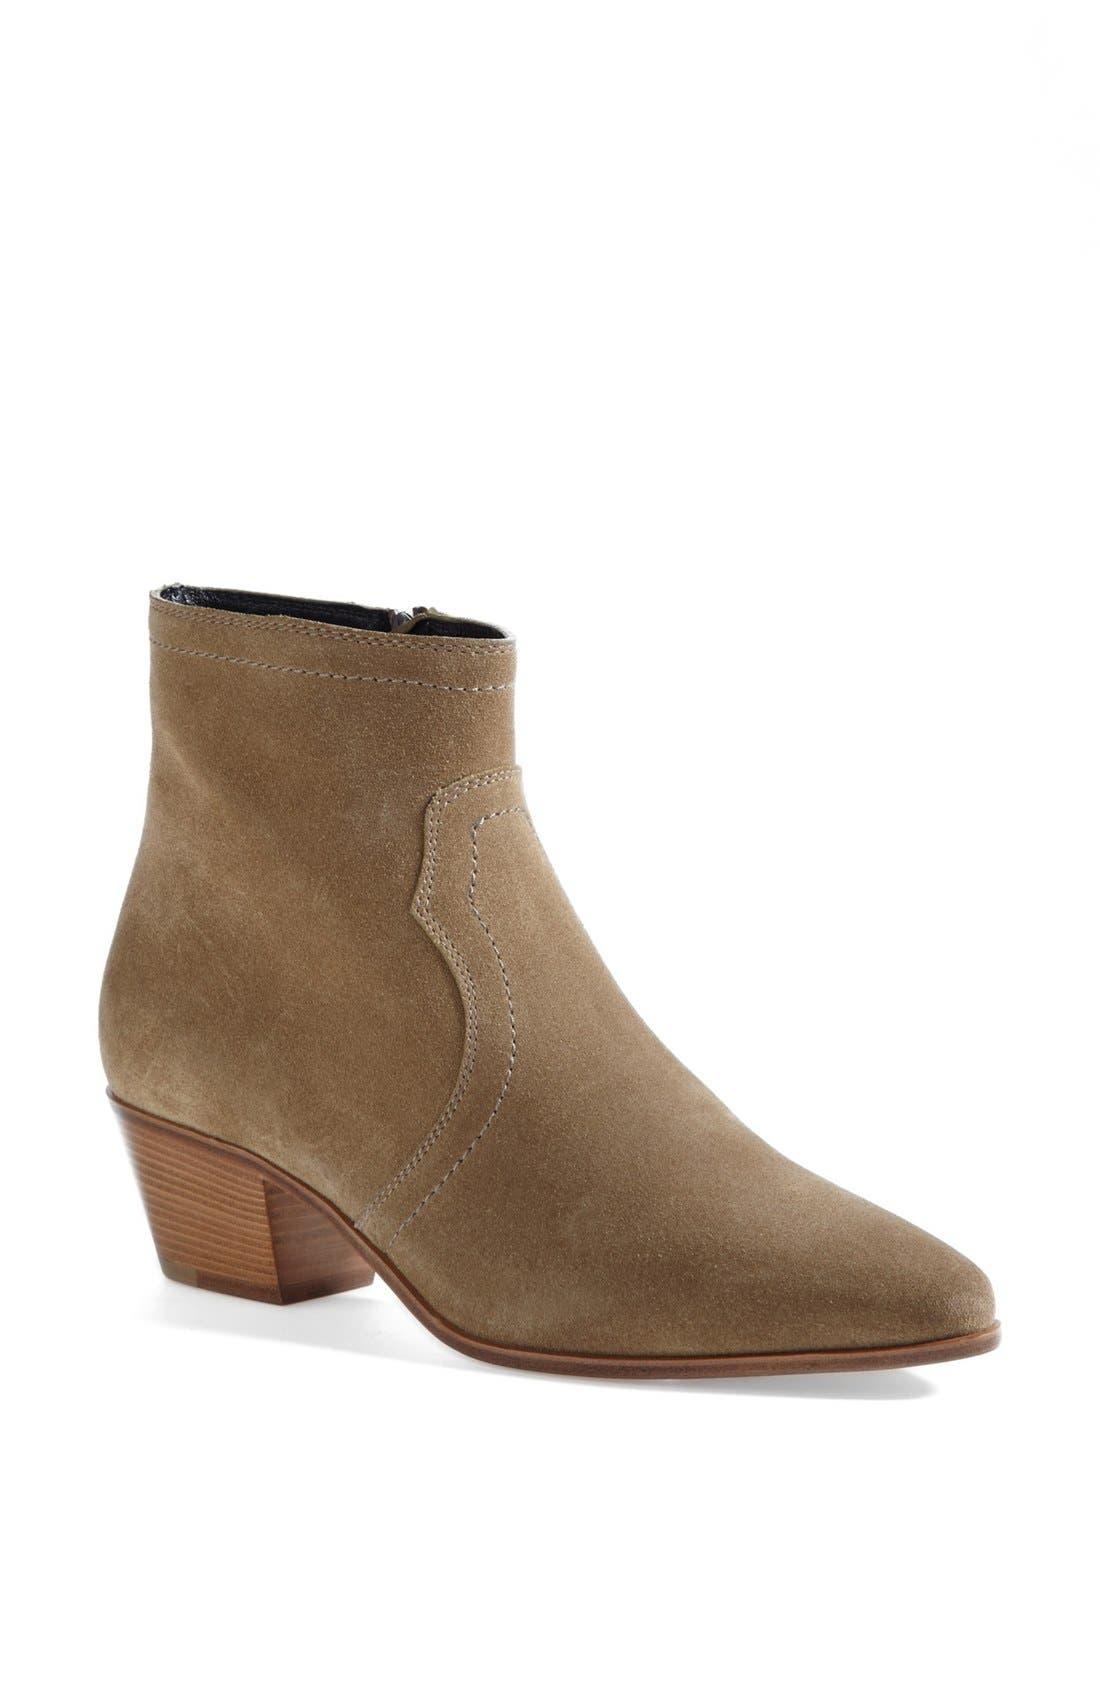 Main Image - Saint Laurent 'Rock' Calfskin Leather Boot